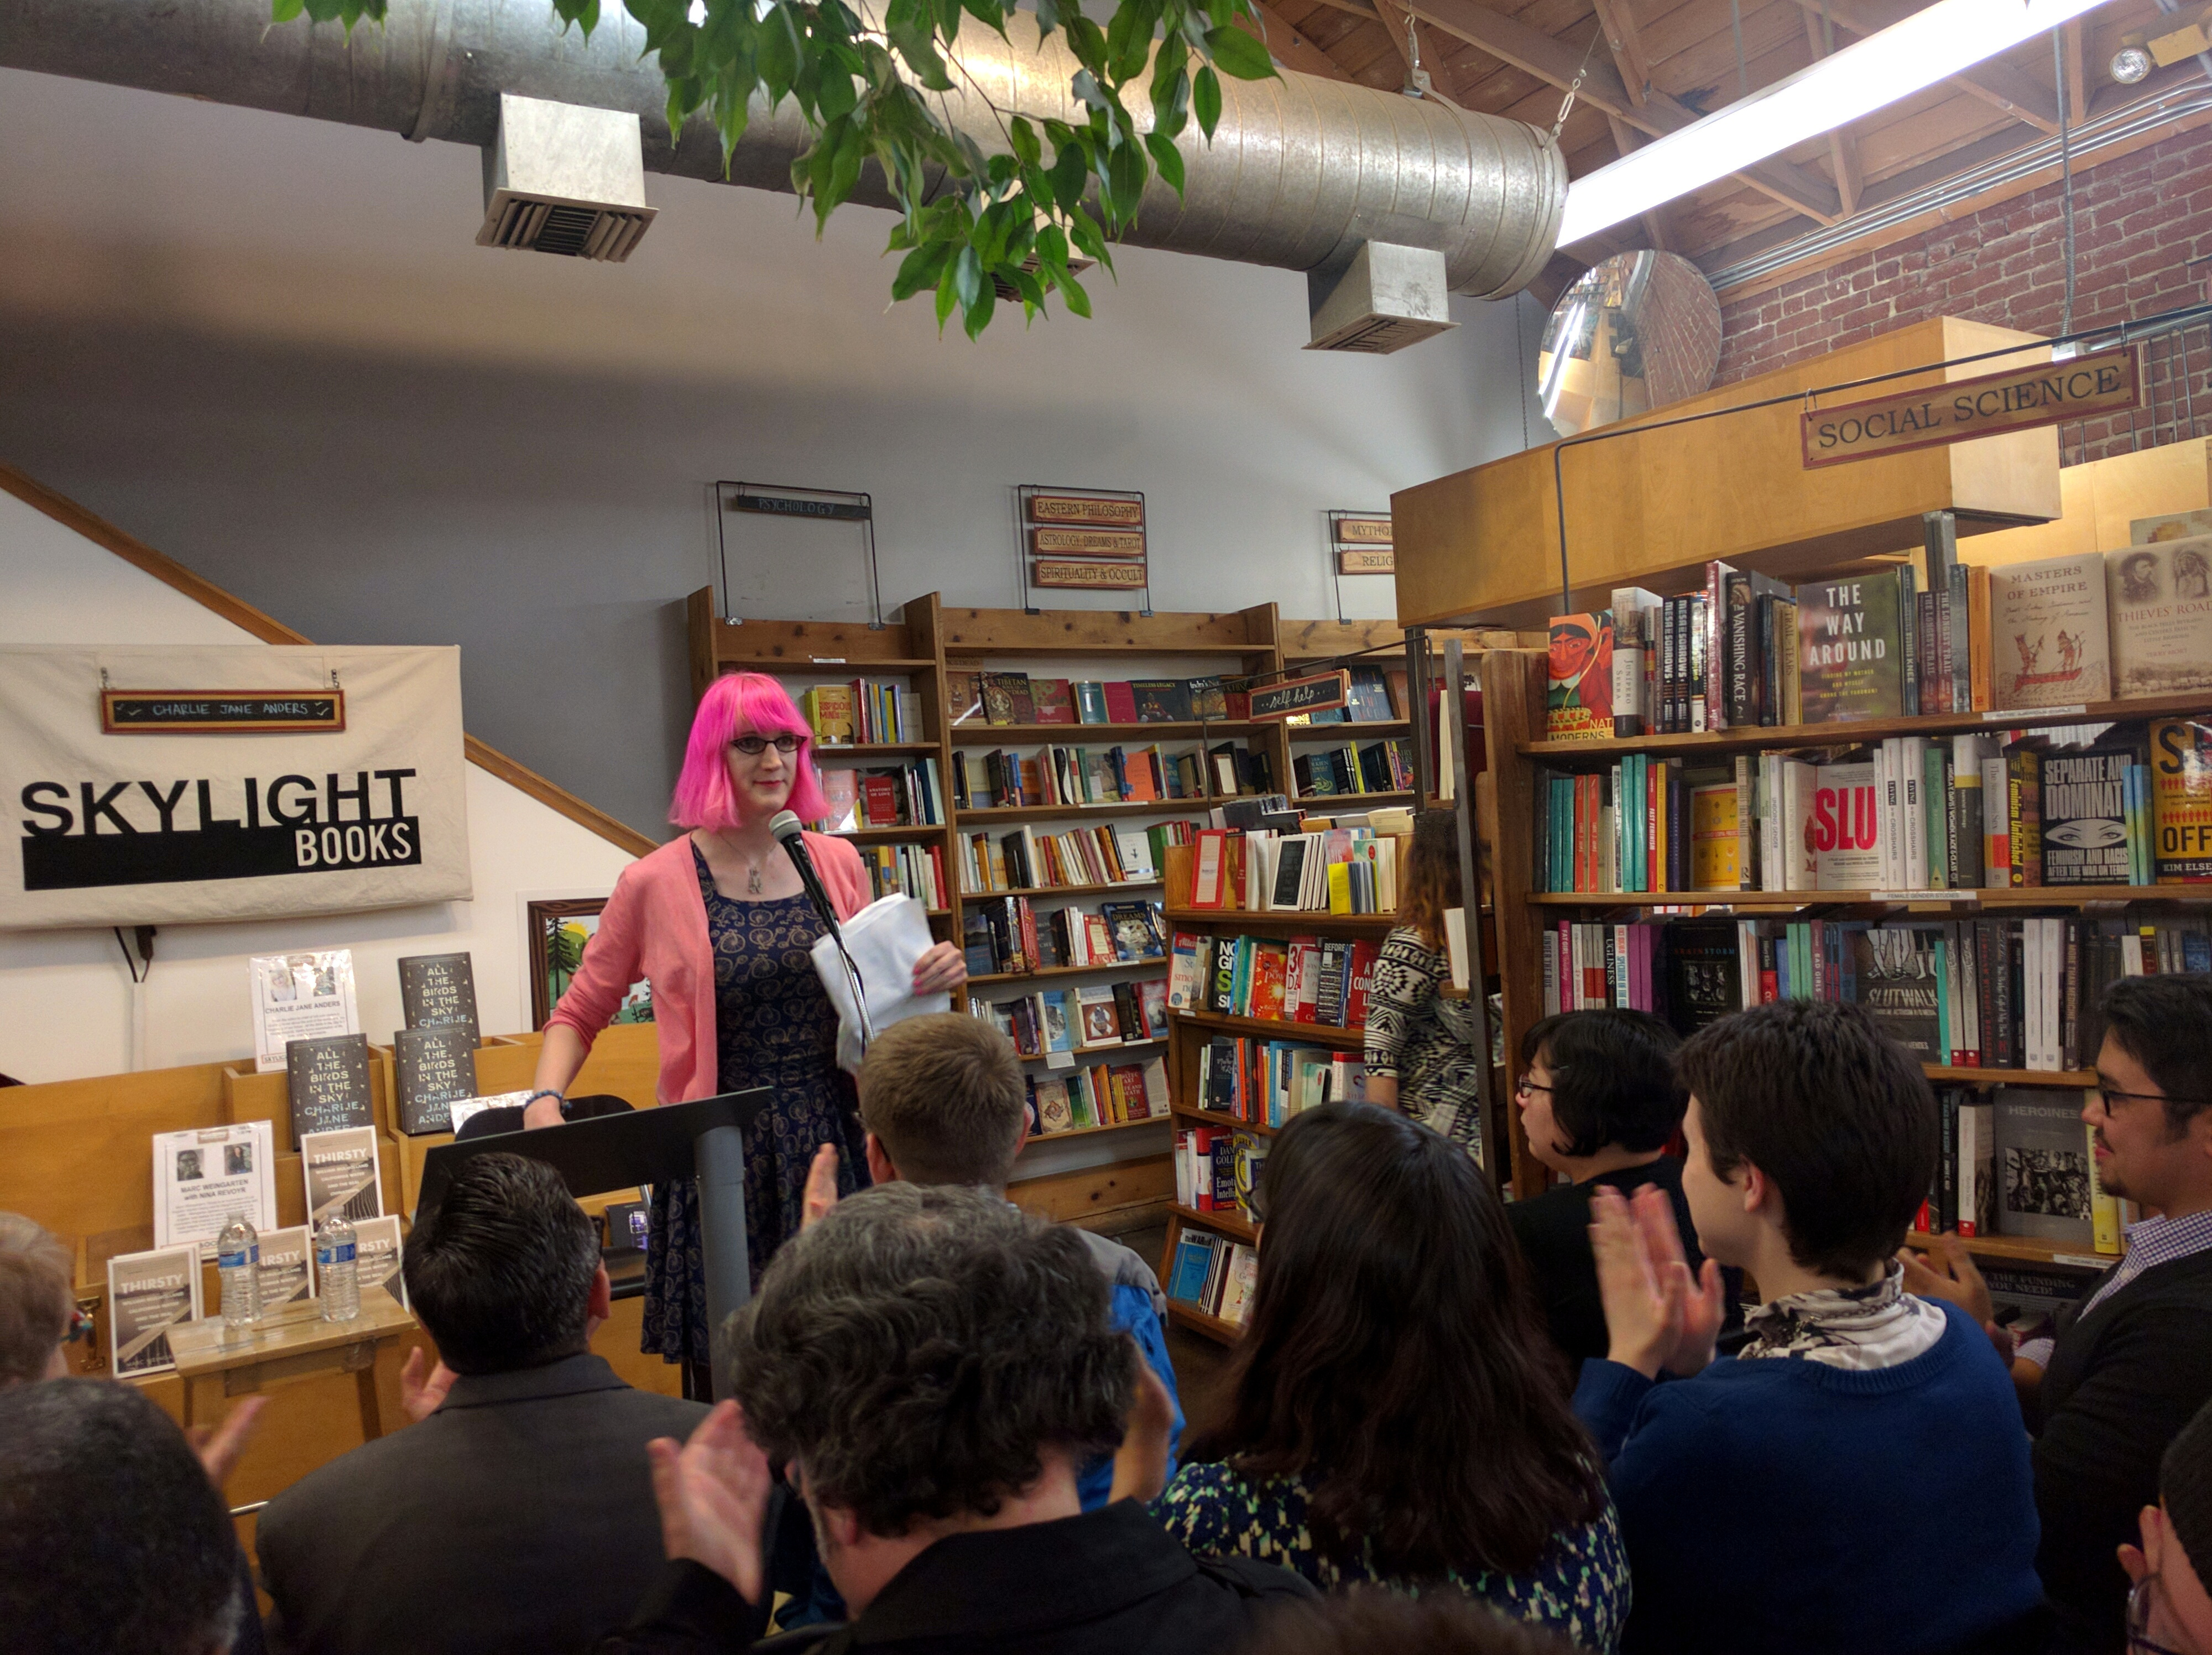 Charlie Jane Anders, Skylight Books, Echo Park, Los Angeles, California, USA